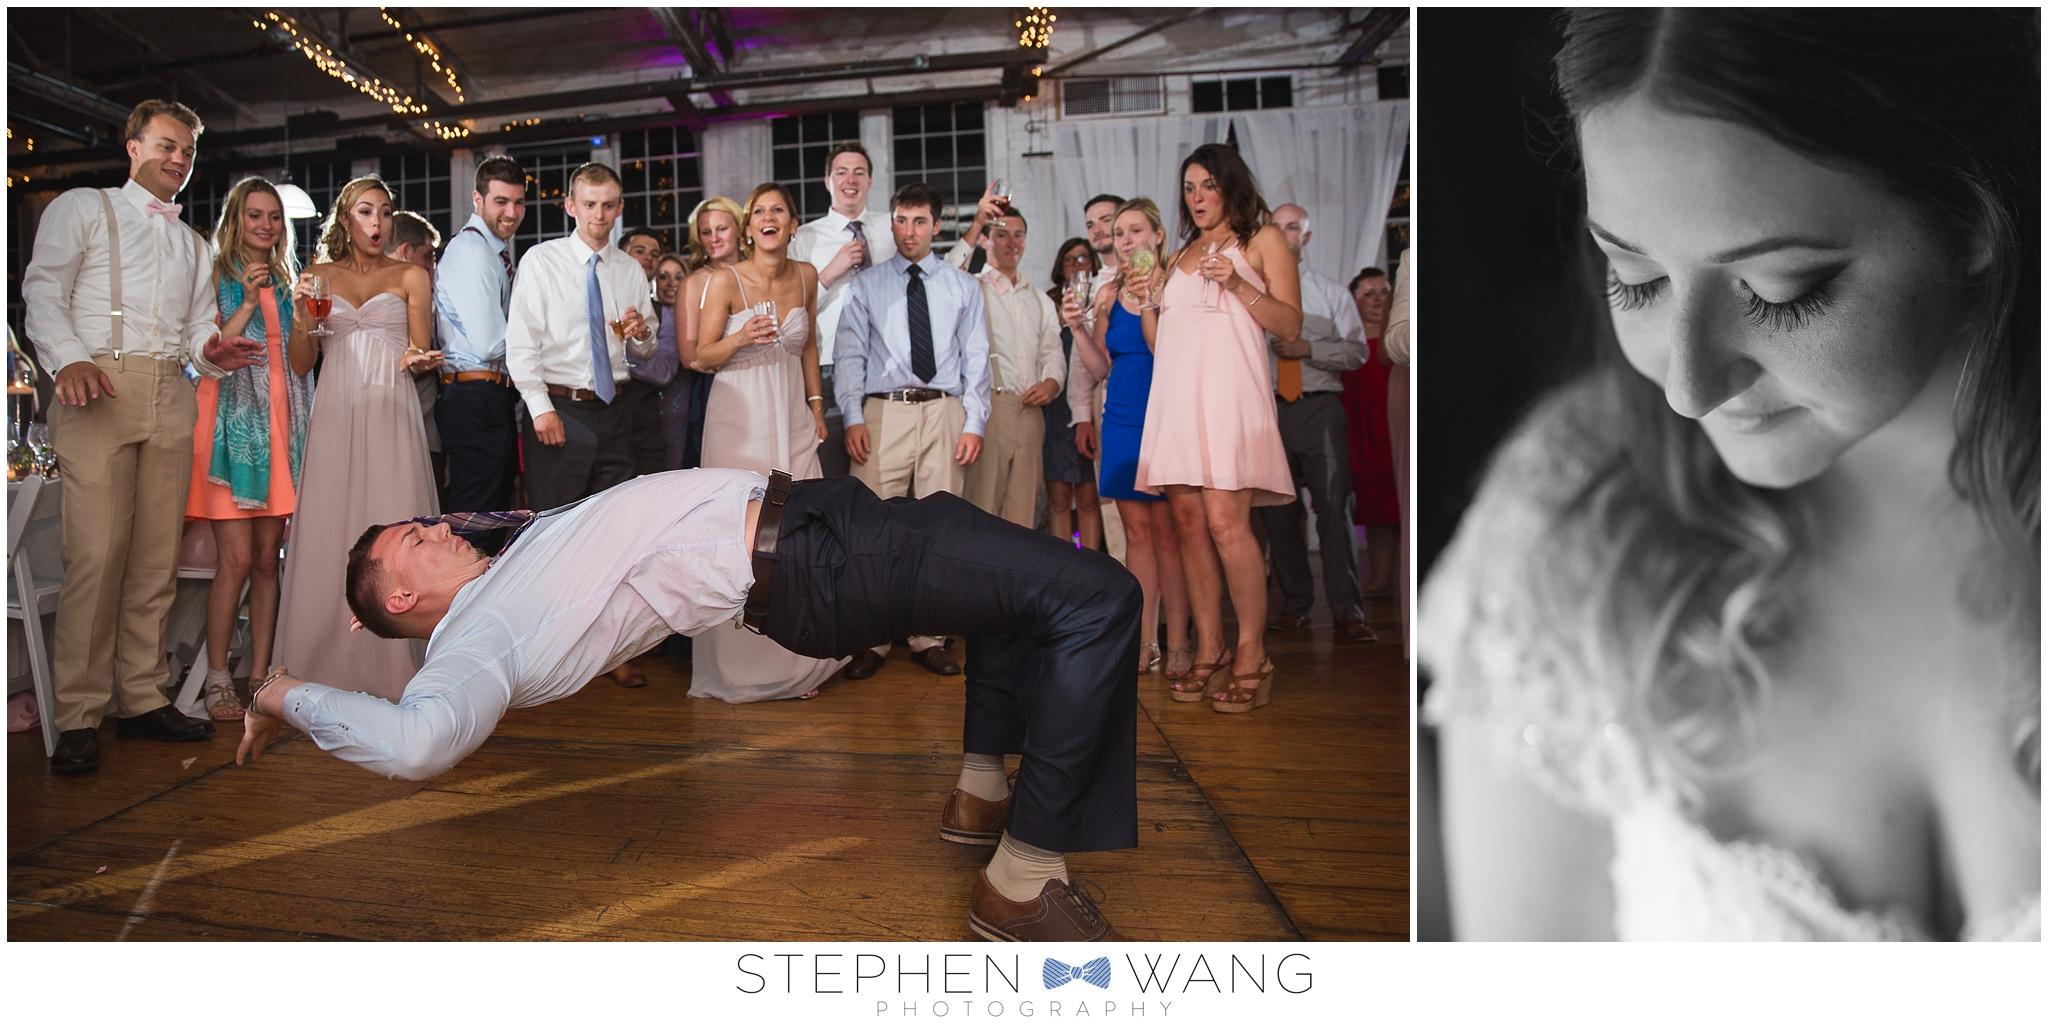 Stephen Wang Photography Wedding Photographer Connecticut CT-12-24_0012.jpg